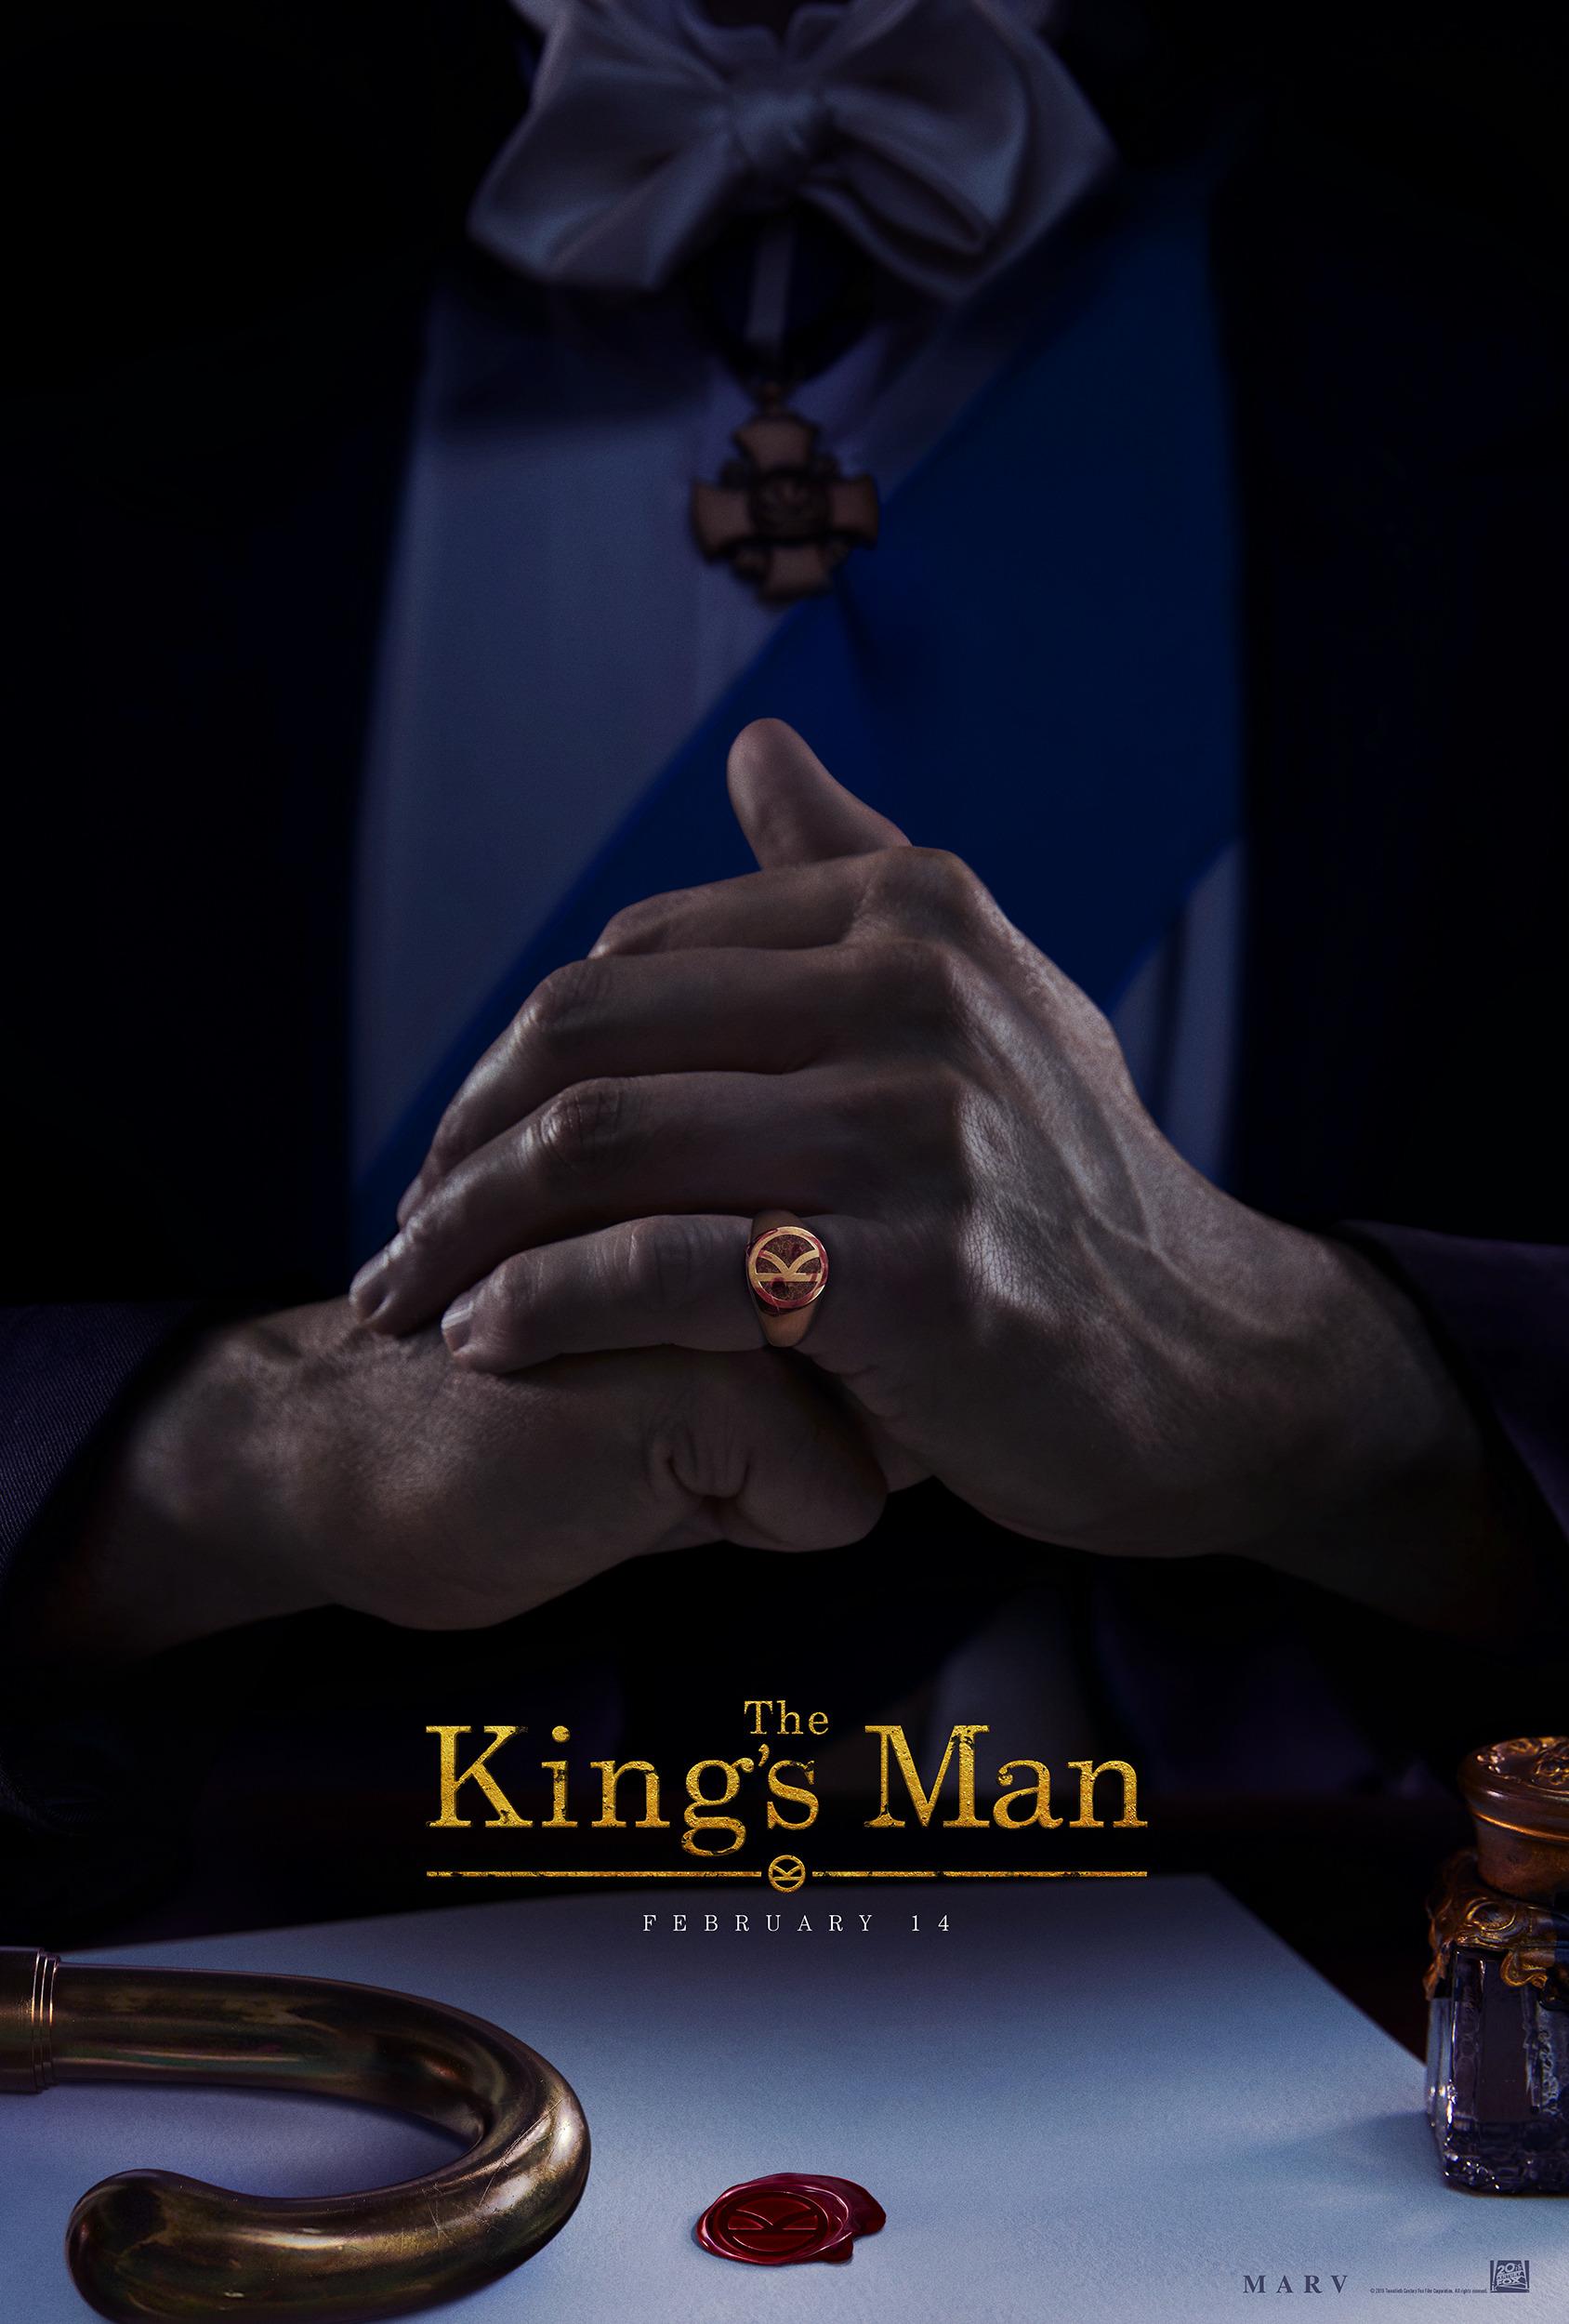 szmk_the_kings_man_kingsman_2.jpg